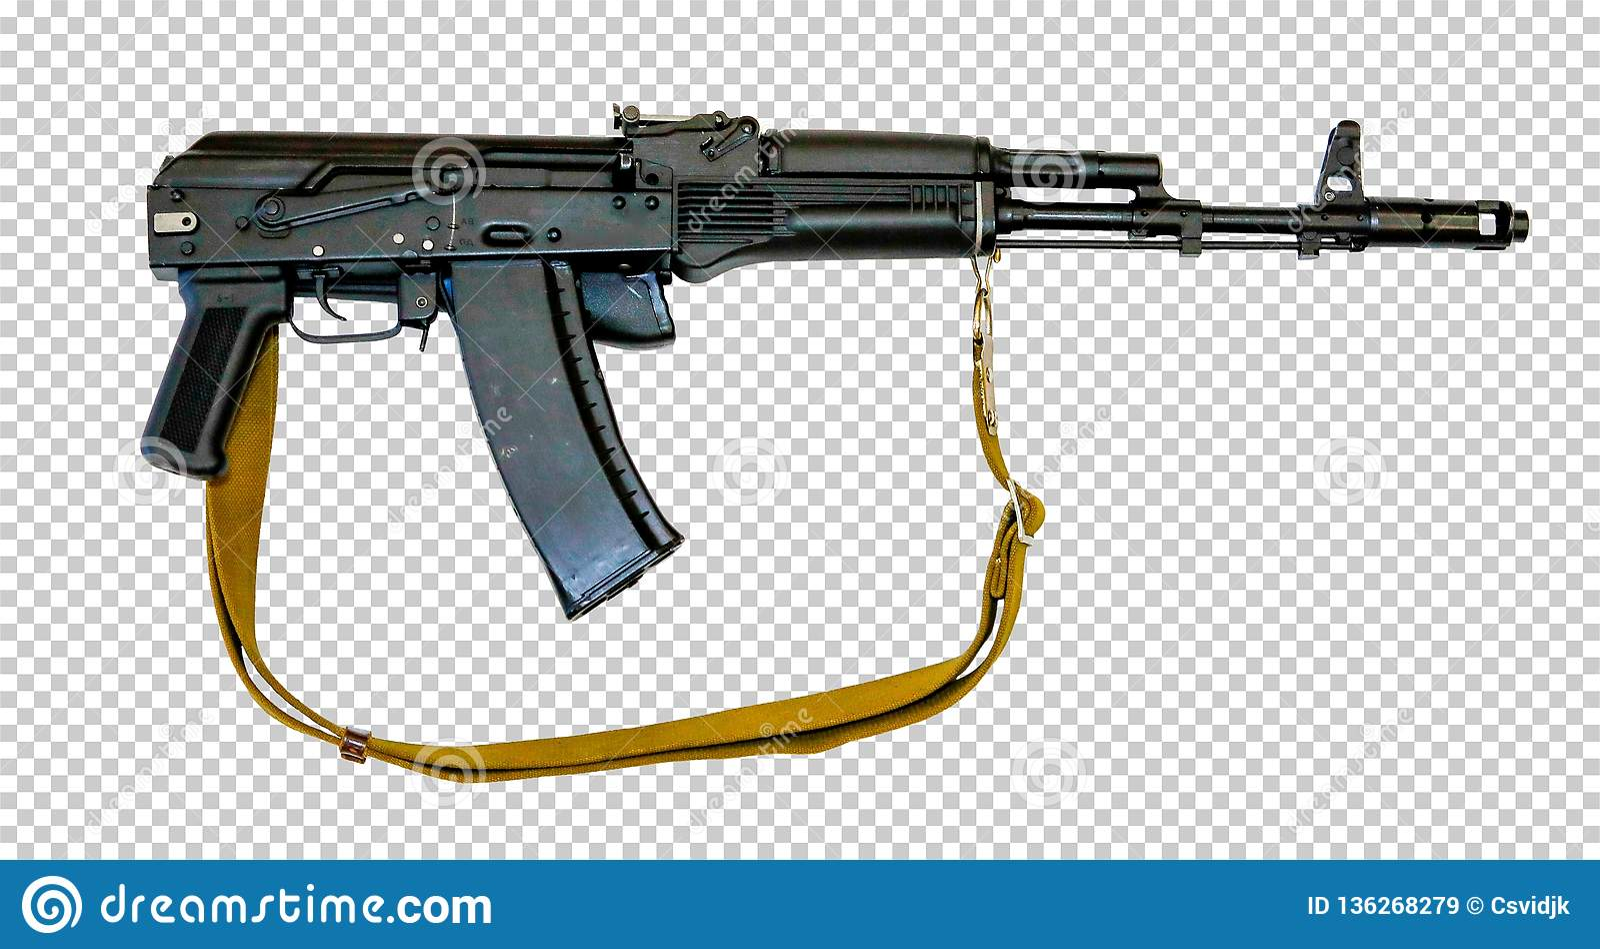 Kalashnikov AK-74M With A Belt, Transparent Background, Png